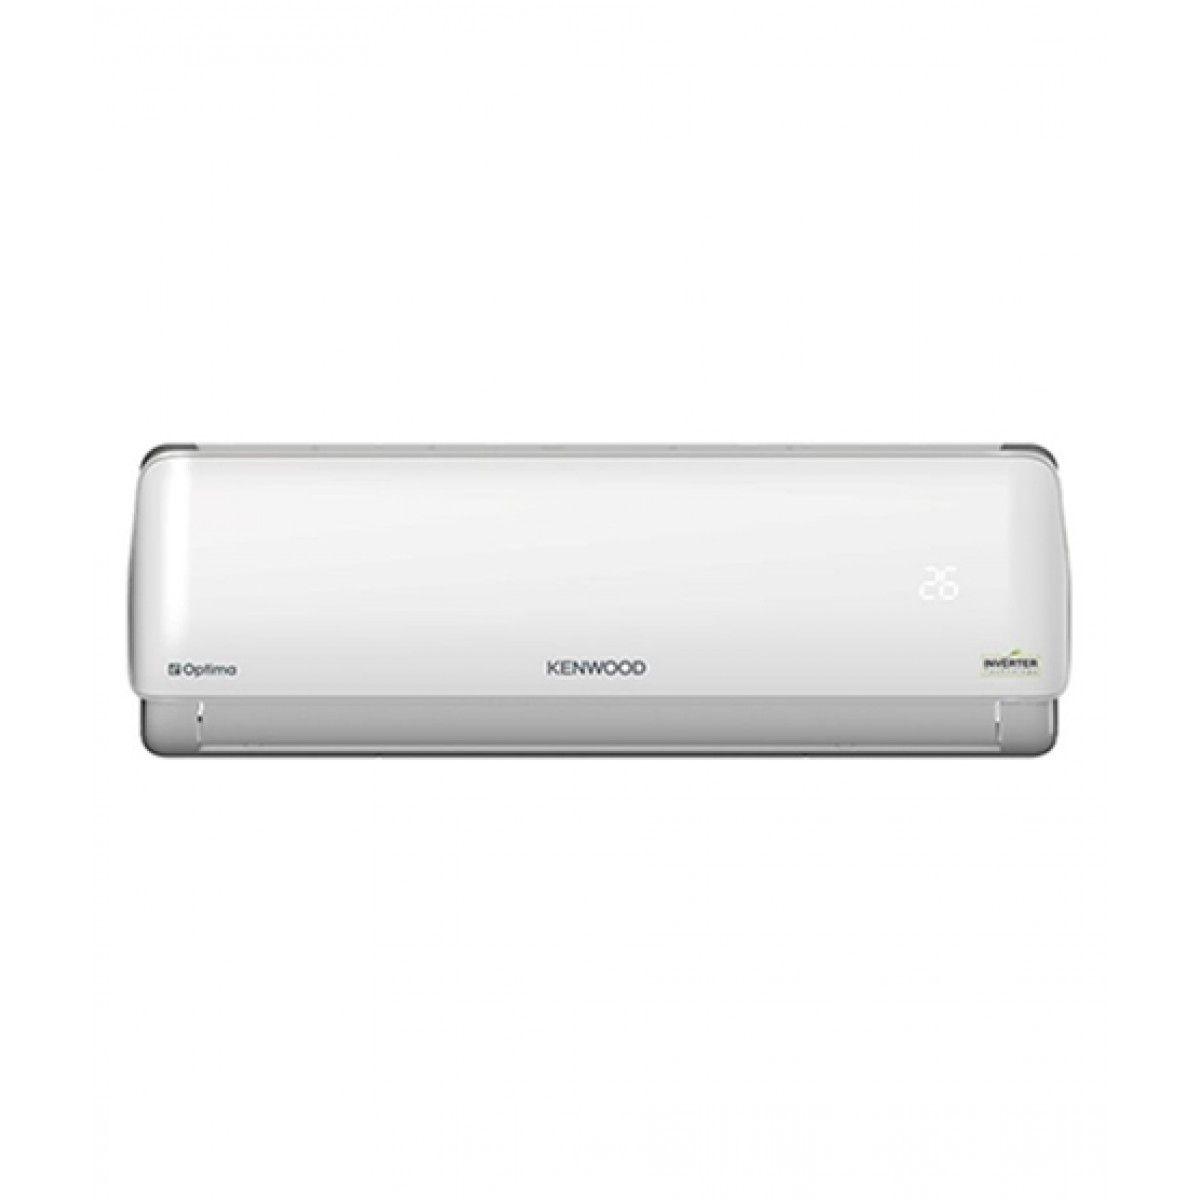 Kenwood E-Optima Inverter AC (KEO-1231S) 1Ton